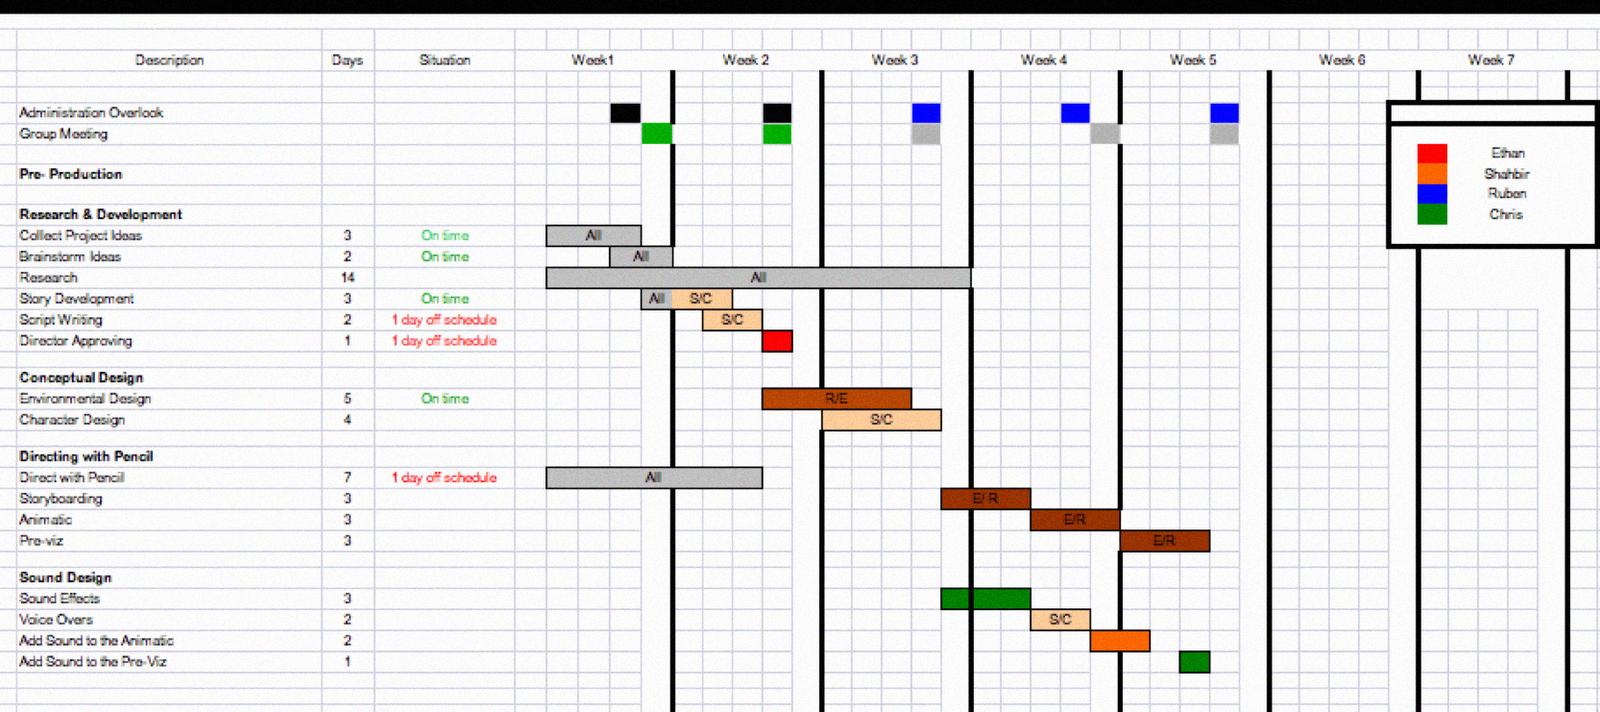 B3d Studios Administration Project Plan 2nd Week Update